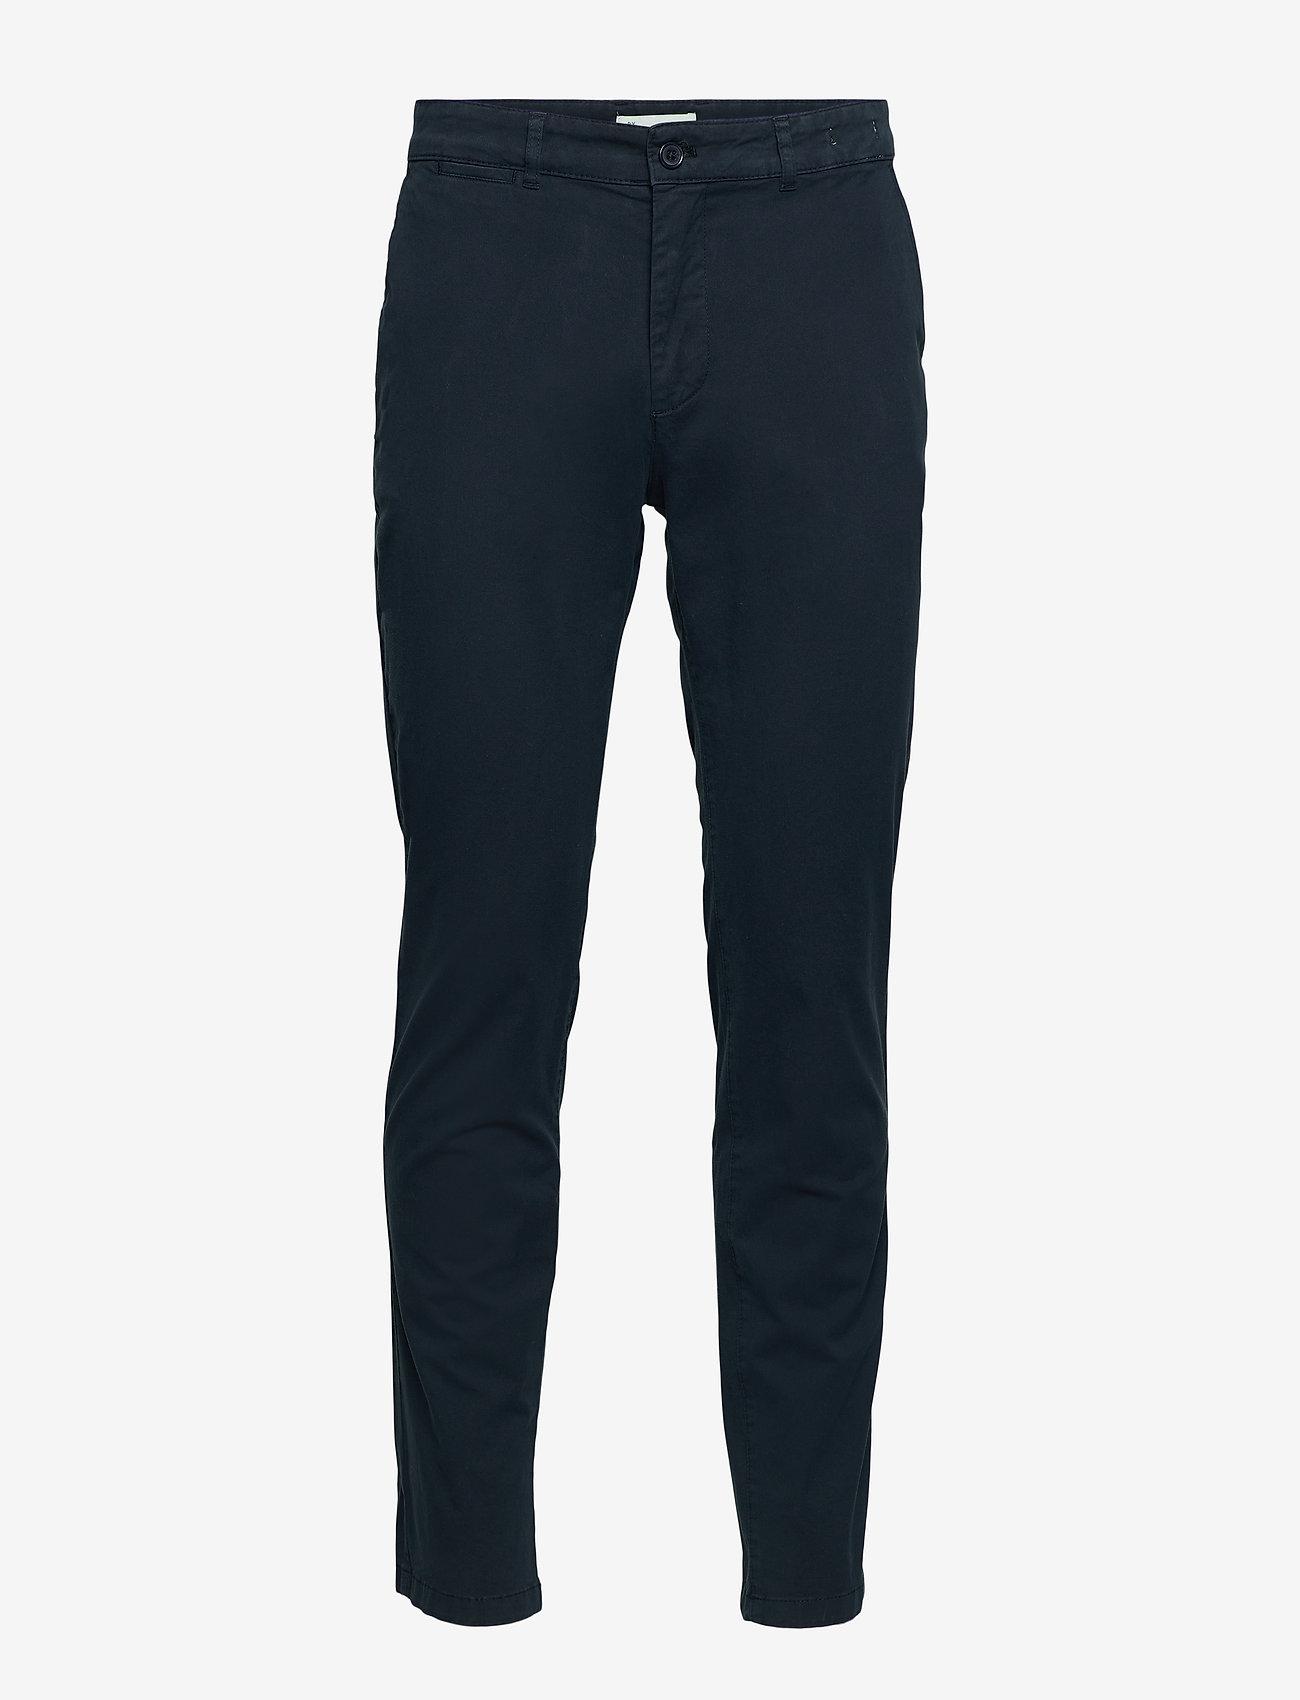 By Garment Makers - The Organic Chino Pants - pantalons chino - navy blazer - 1